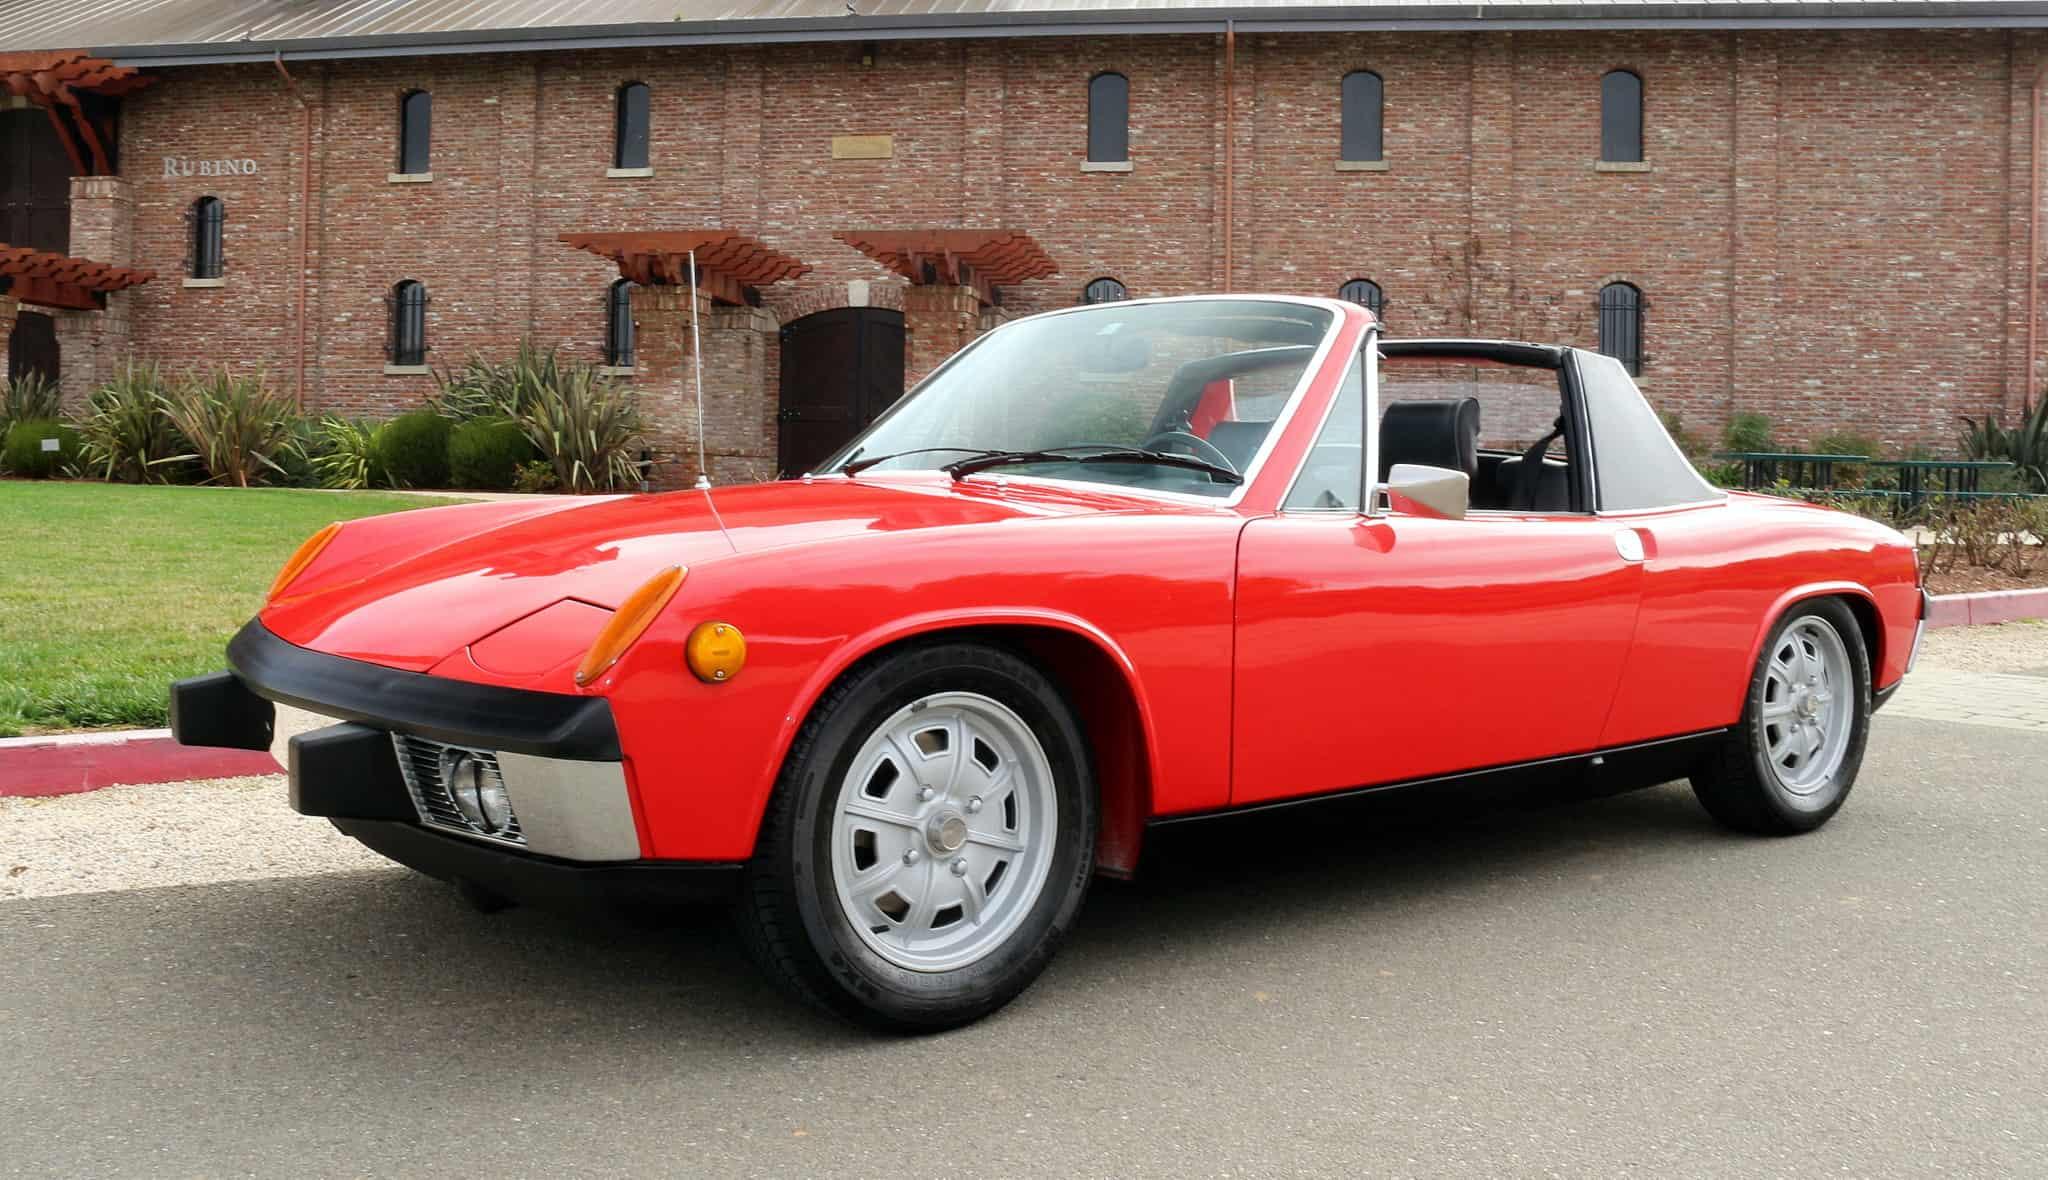 1973 Porsche 914 Targa For Sale Contact Dusty Cars